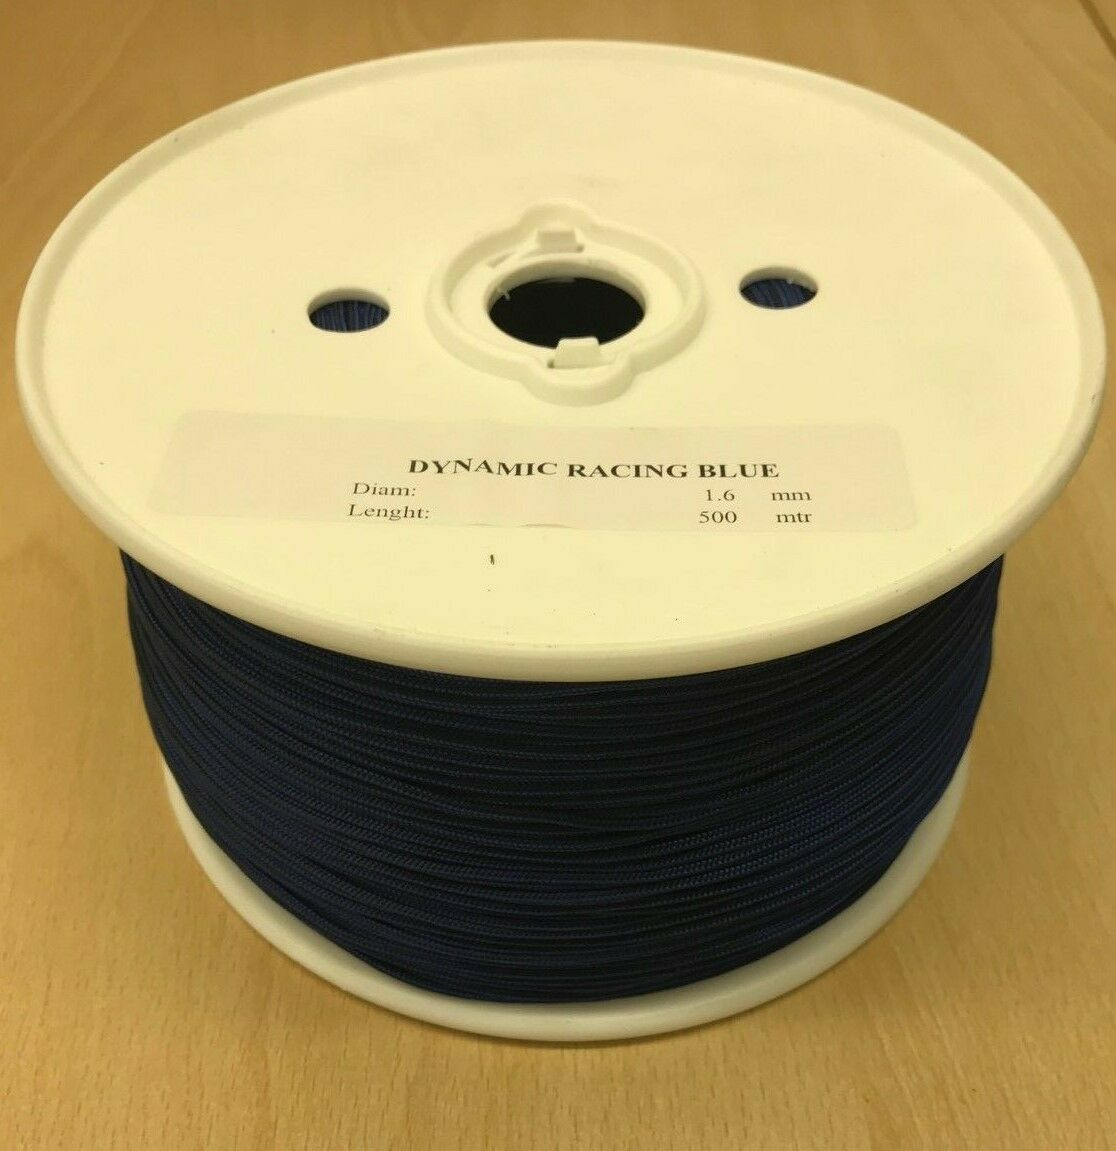 1.6mm Kite Line Dyneema Rope, Polyester Cover, Komplett 500m Reel